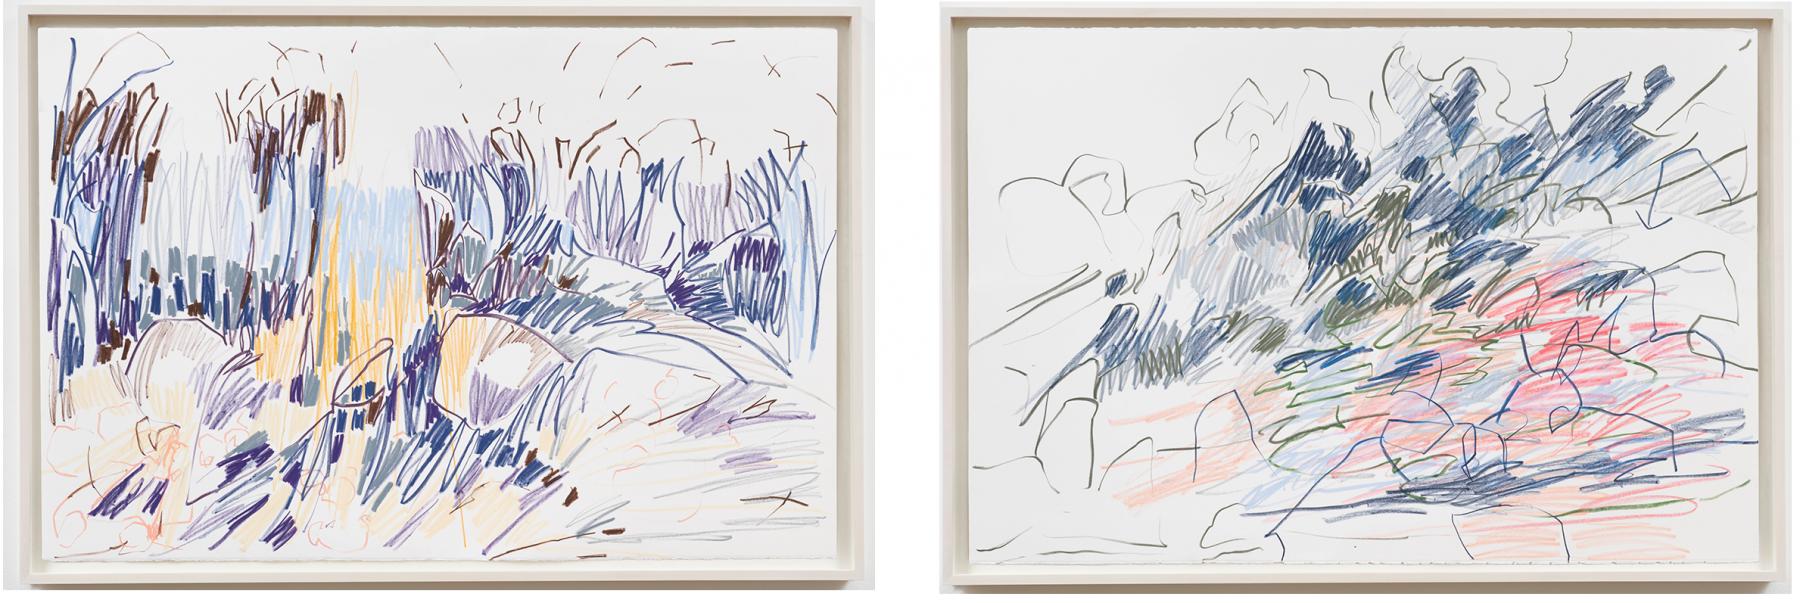 colorfield drawing III, VII